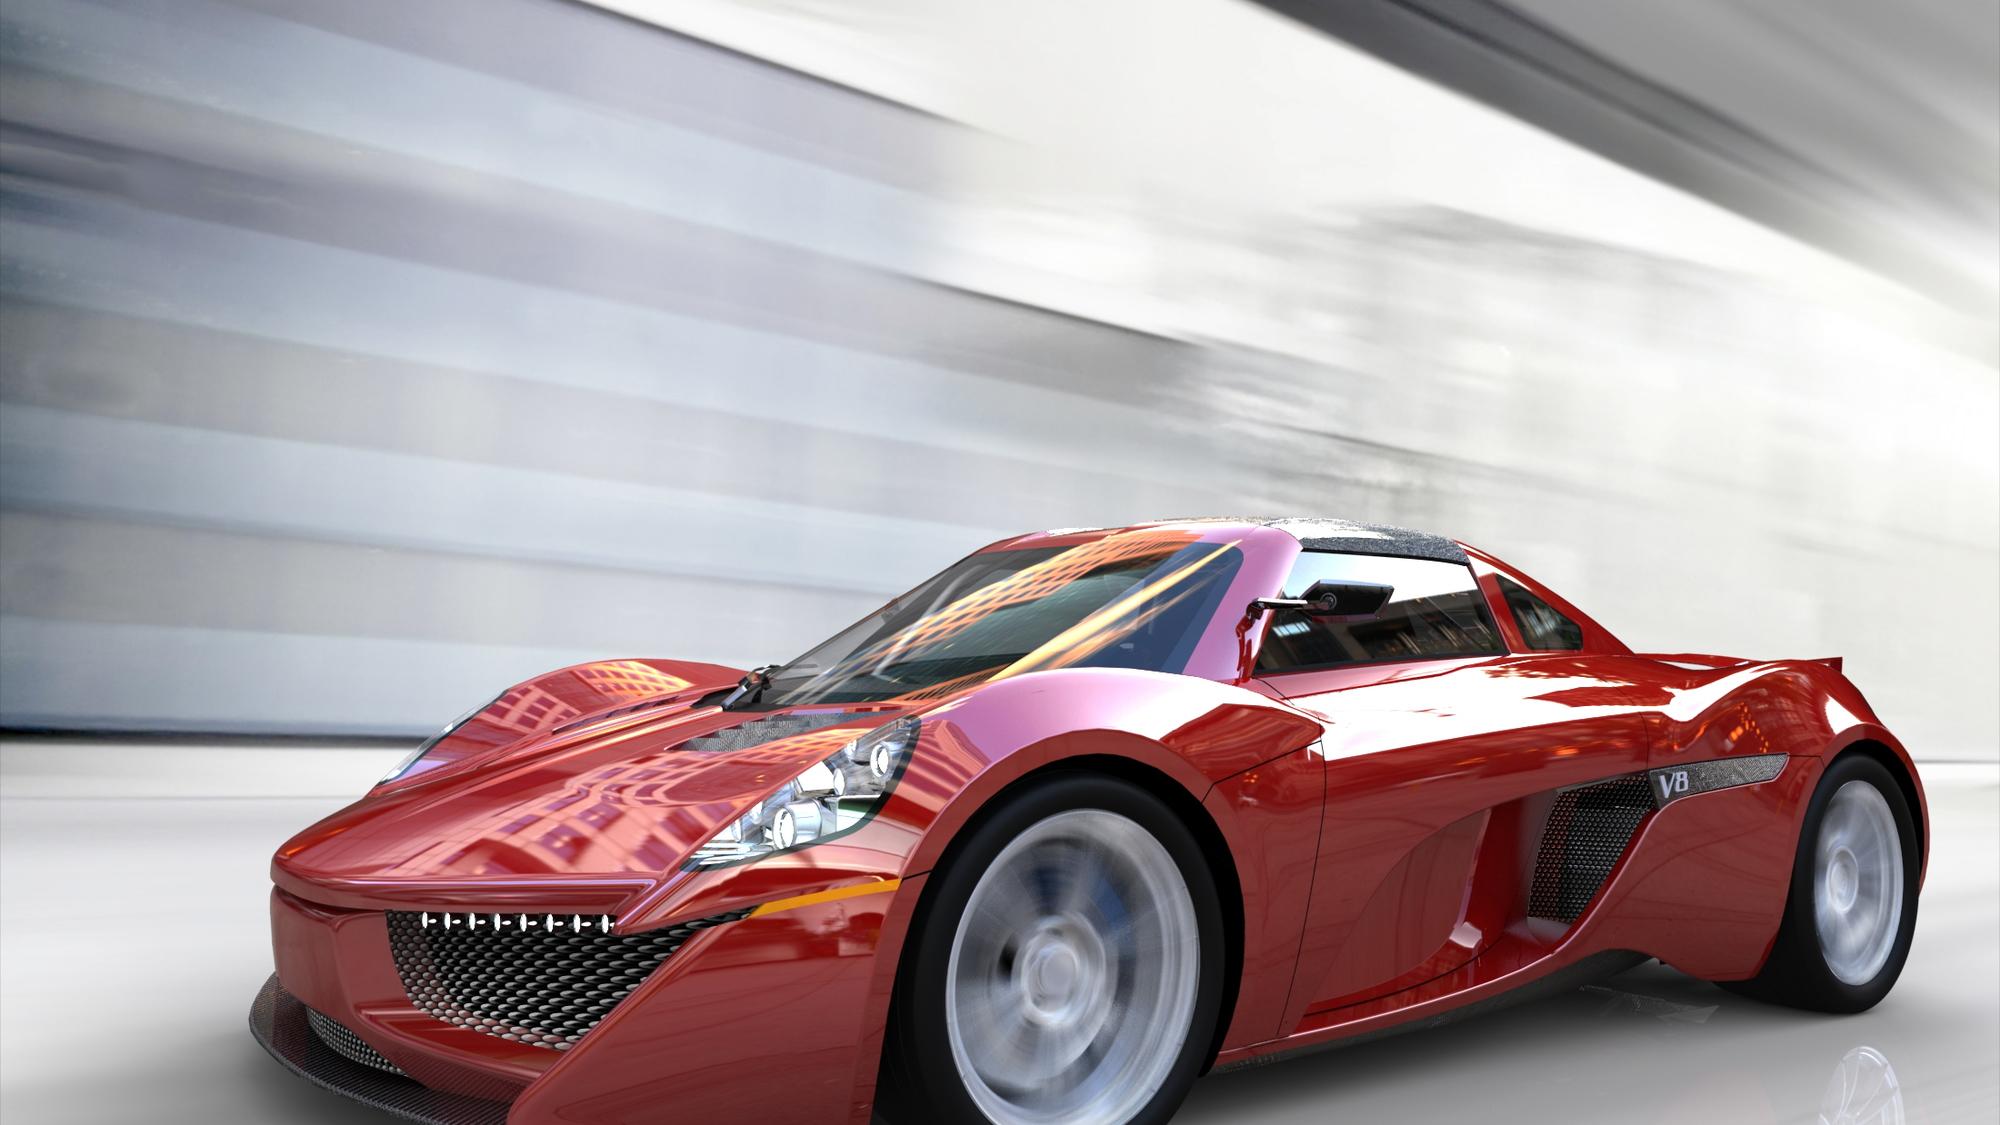 Darren McKeage's Tosa Street Car supercar design